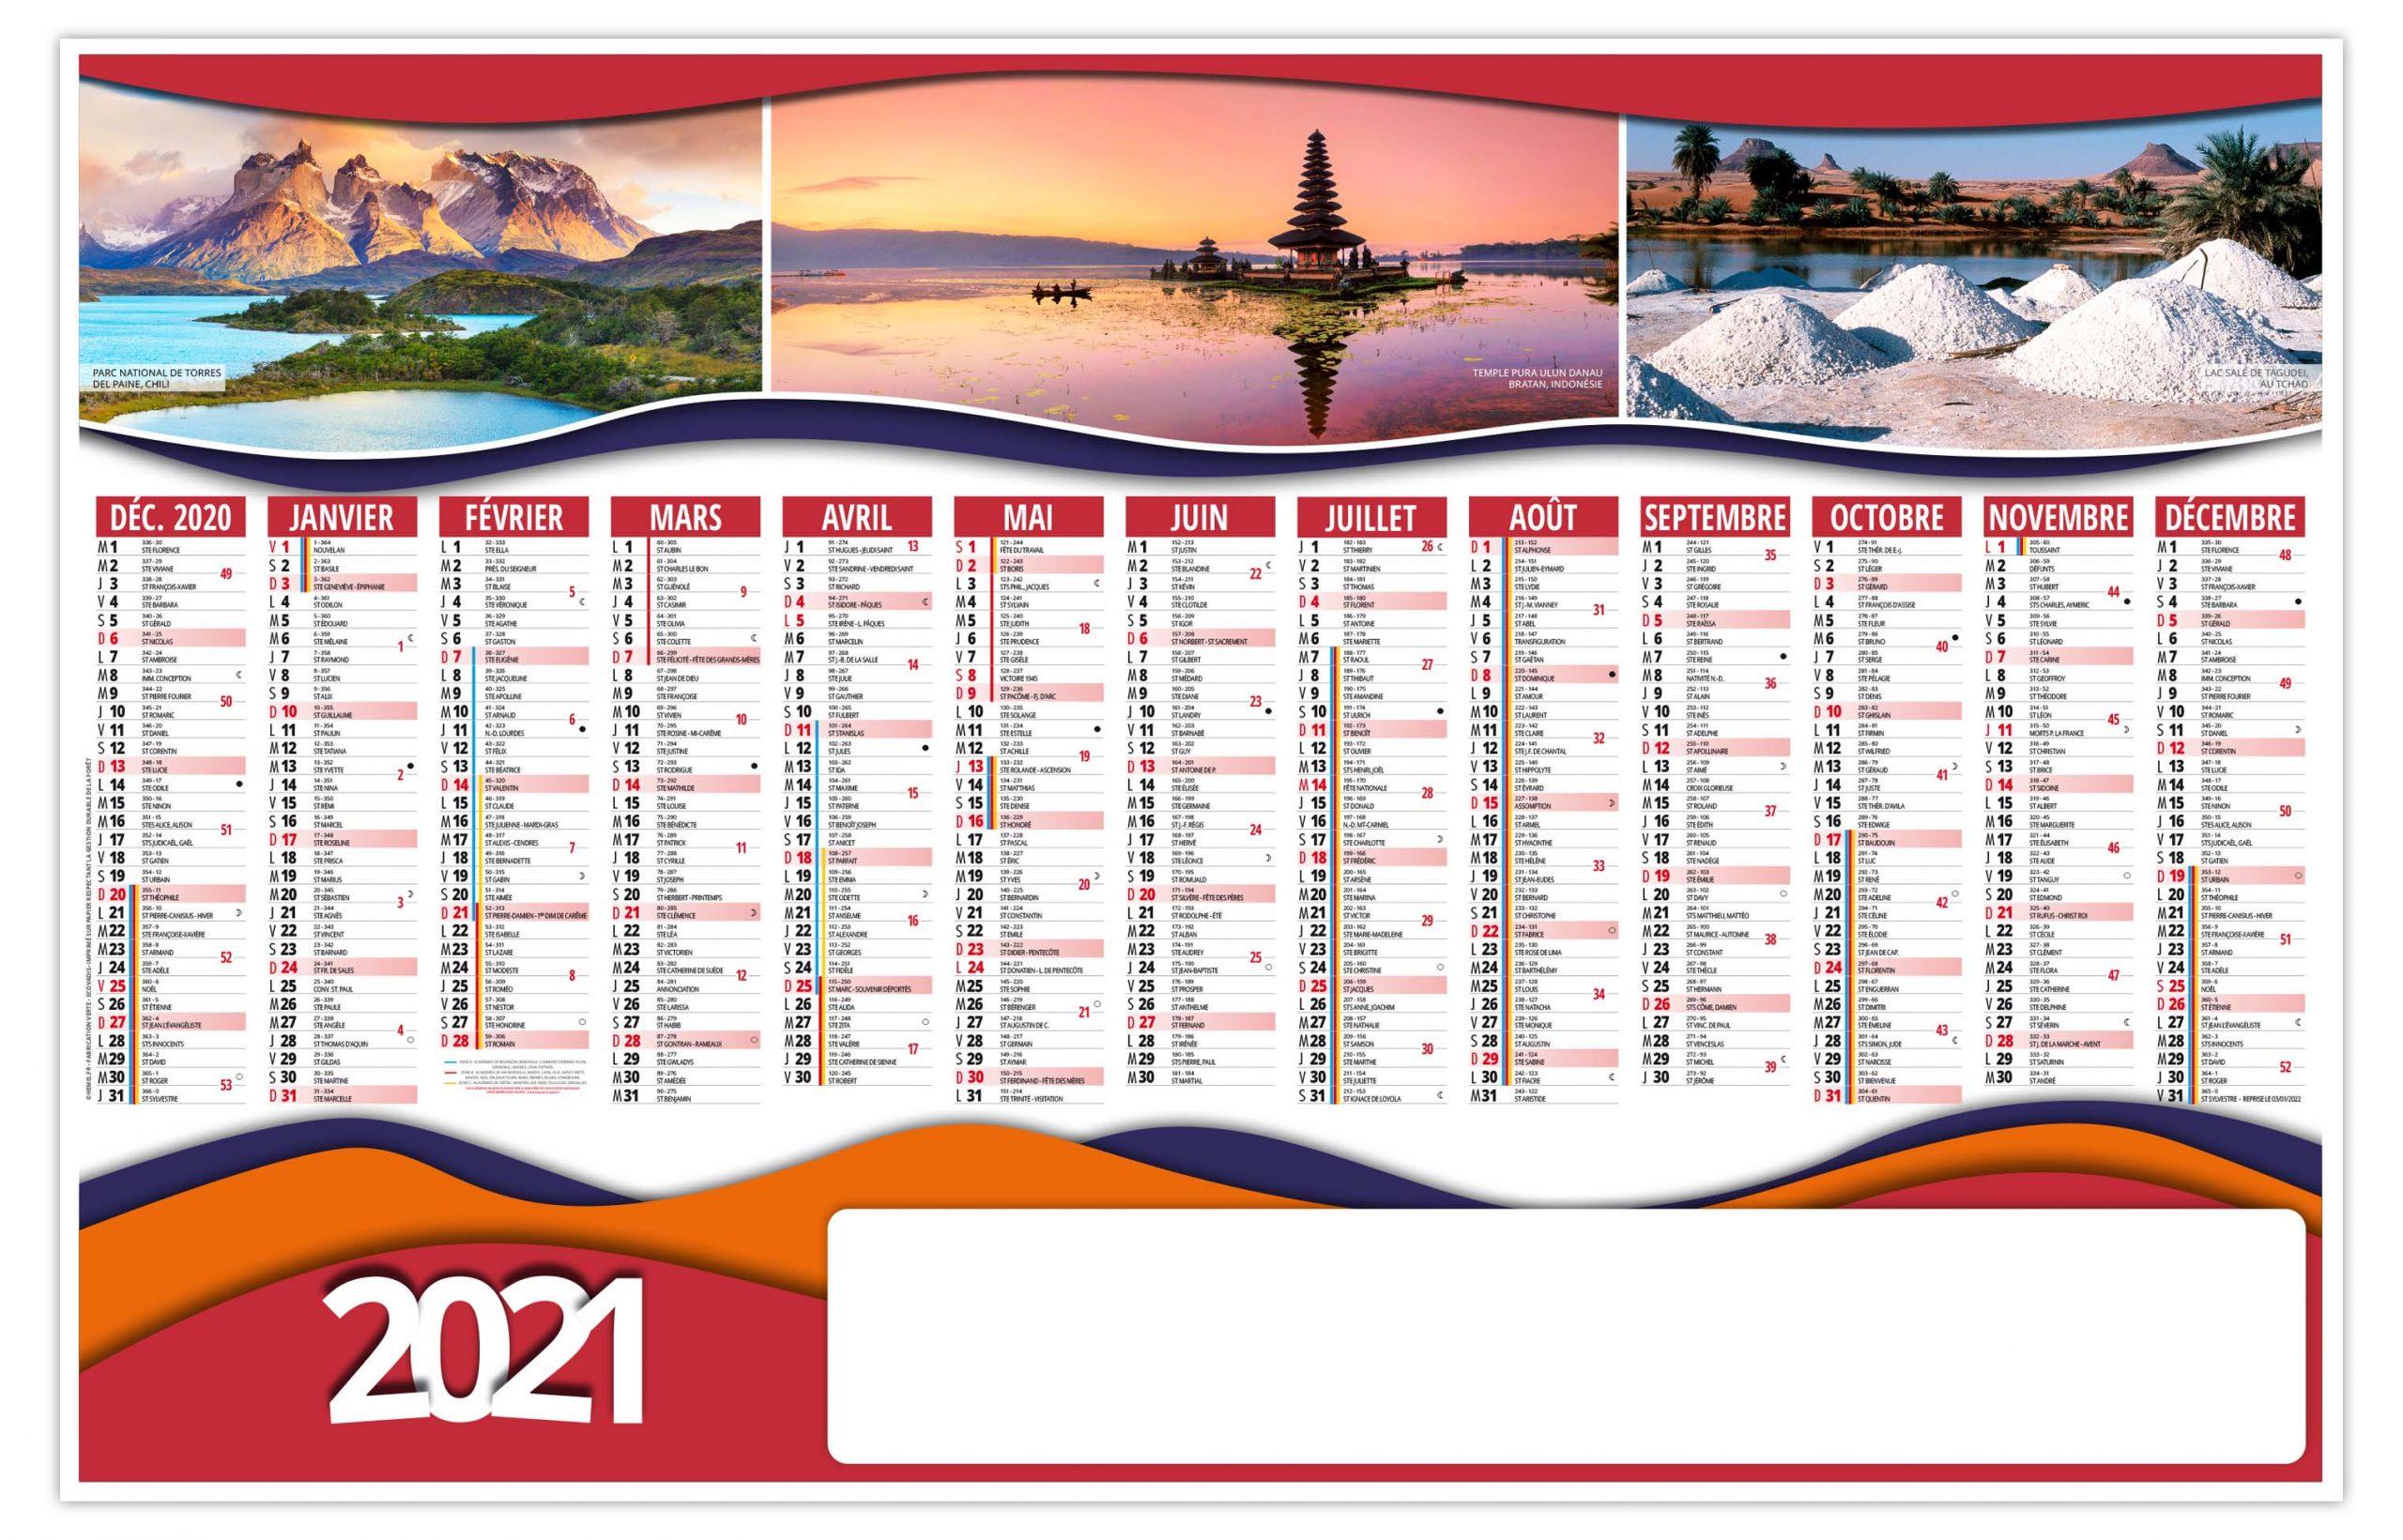 Richesses 2021   Calendrier 2021   Sérigraphie & Impression APO Pub